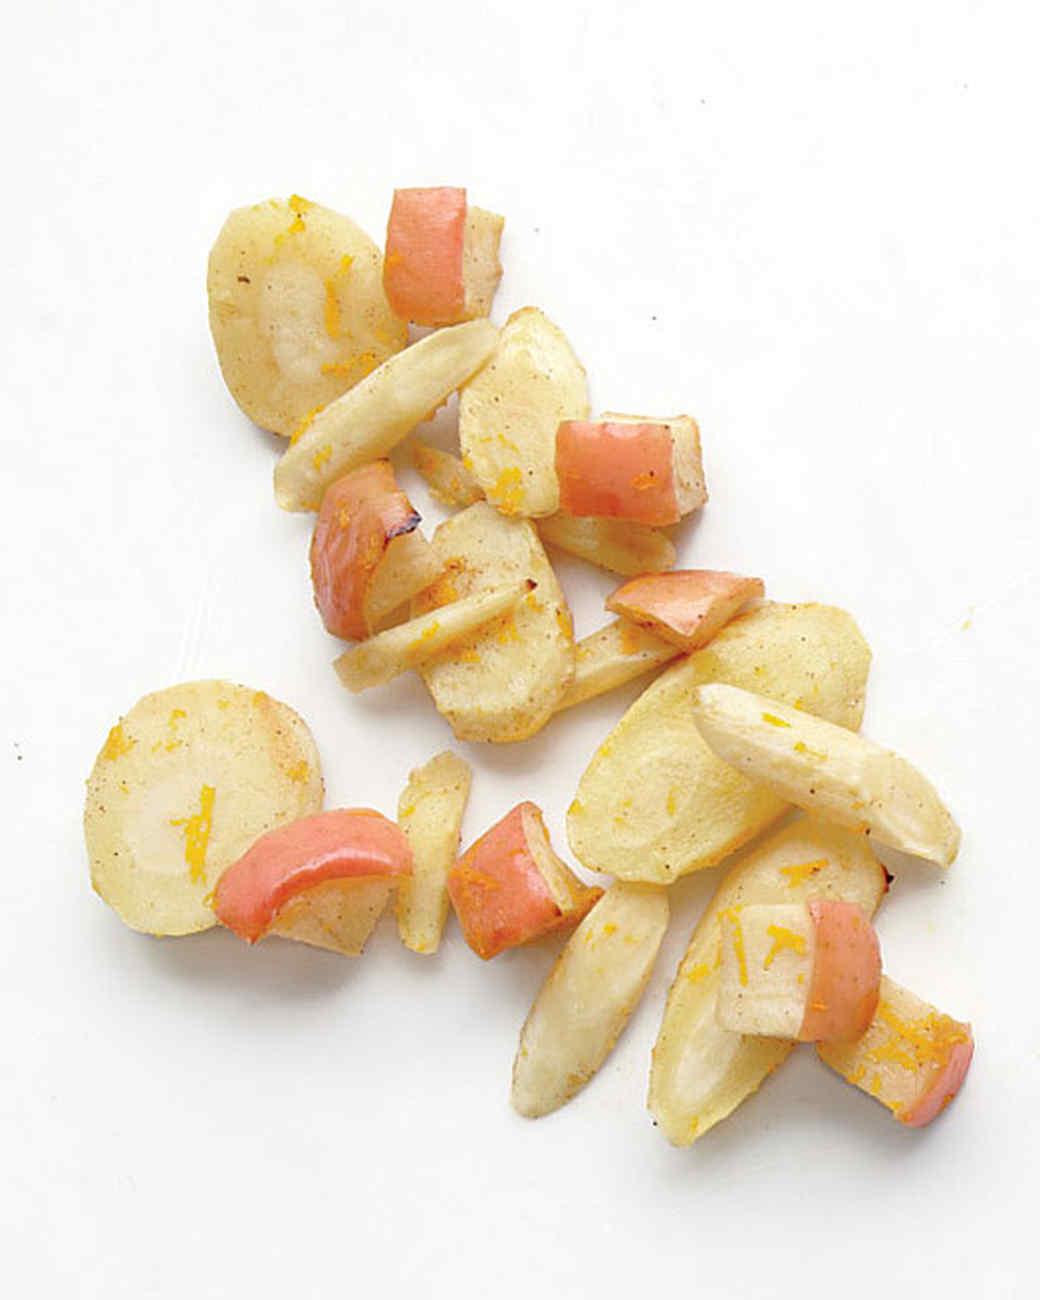 roasted-parsnips-apples-med107801.jpg